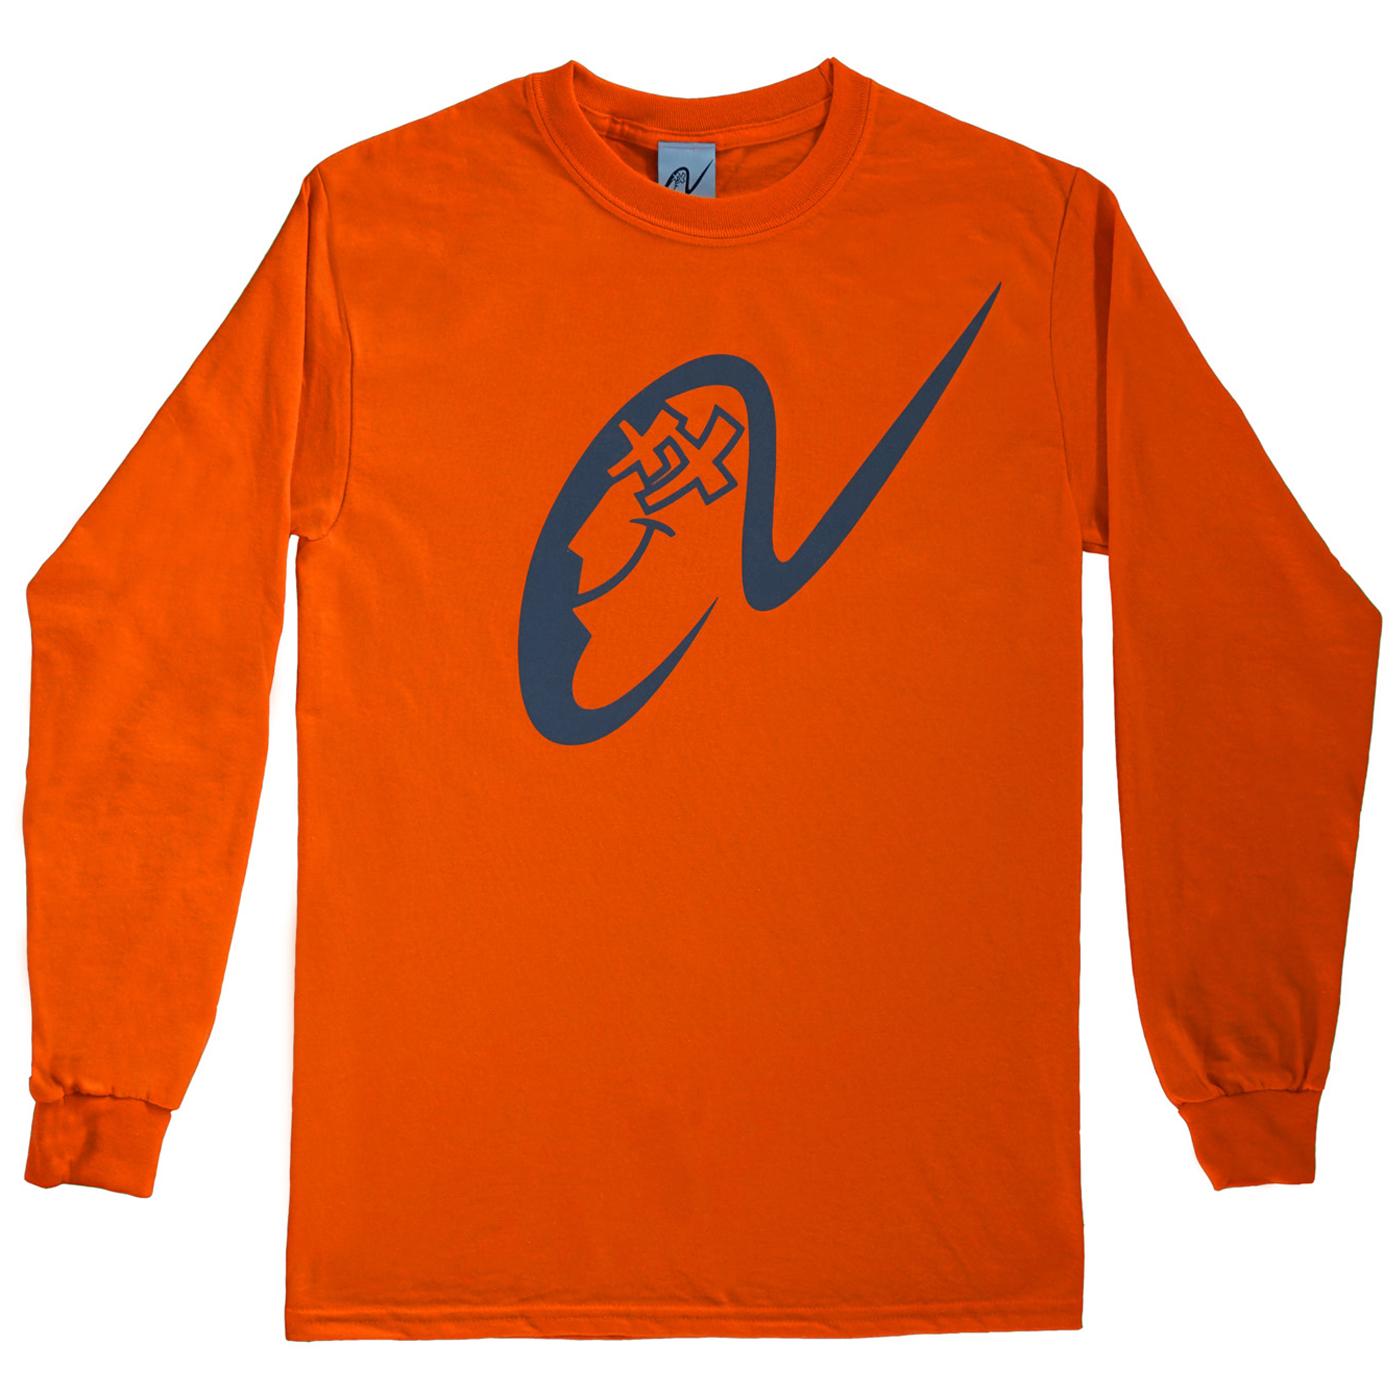 ass-orange-tee1